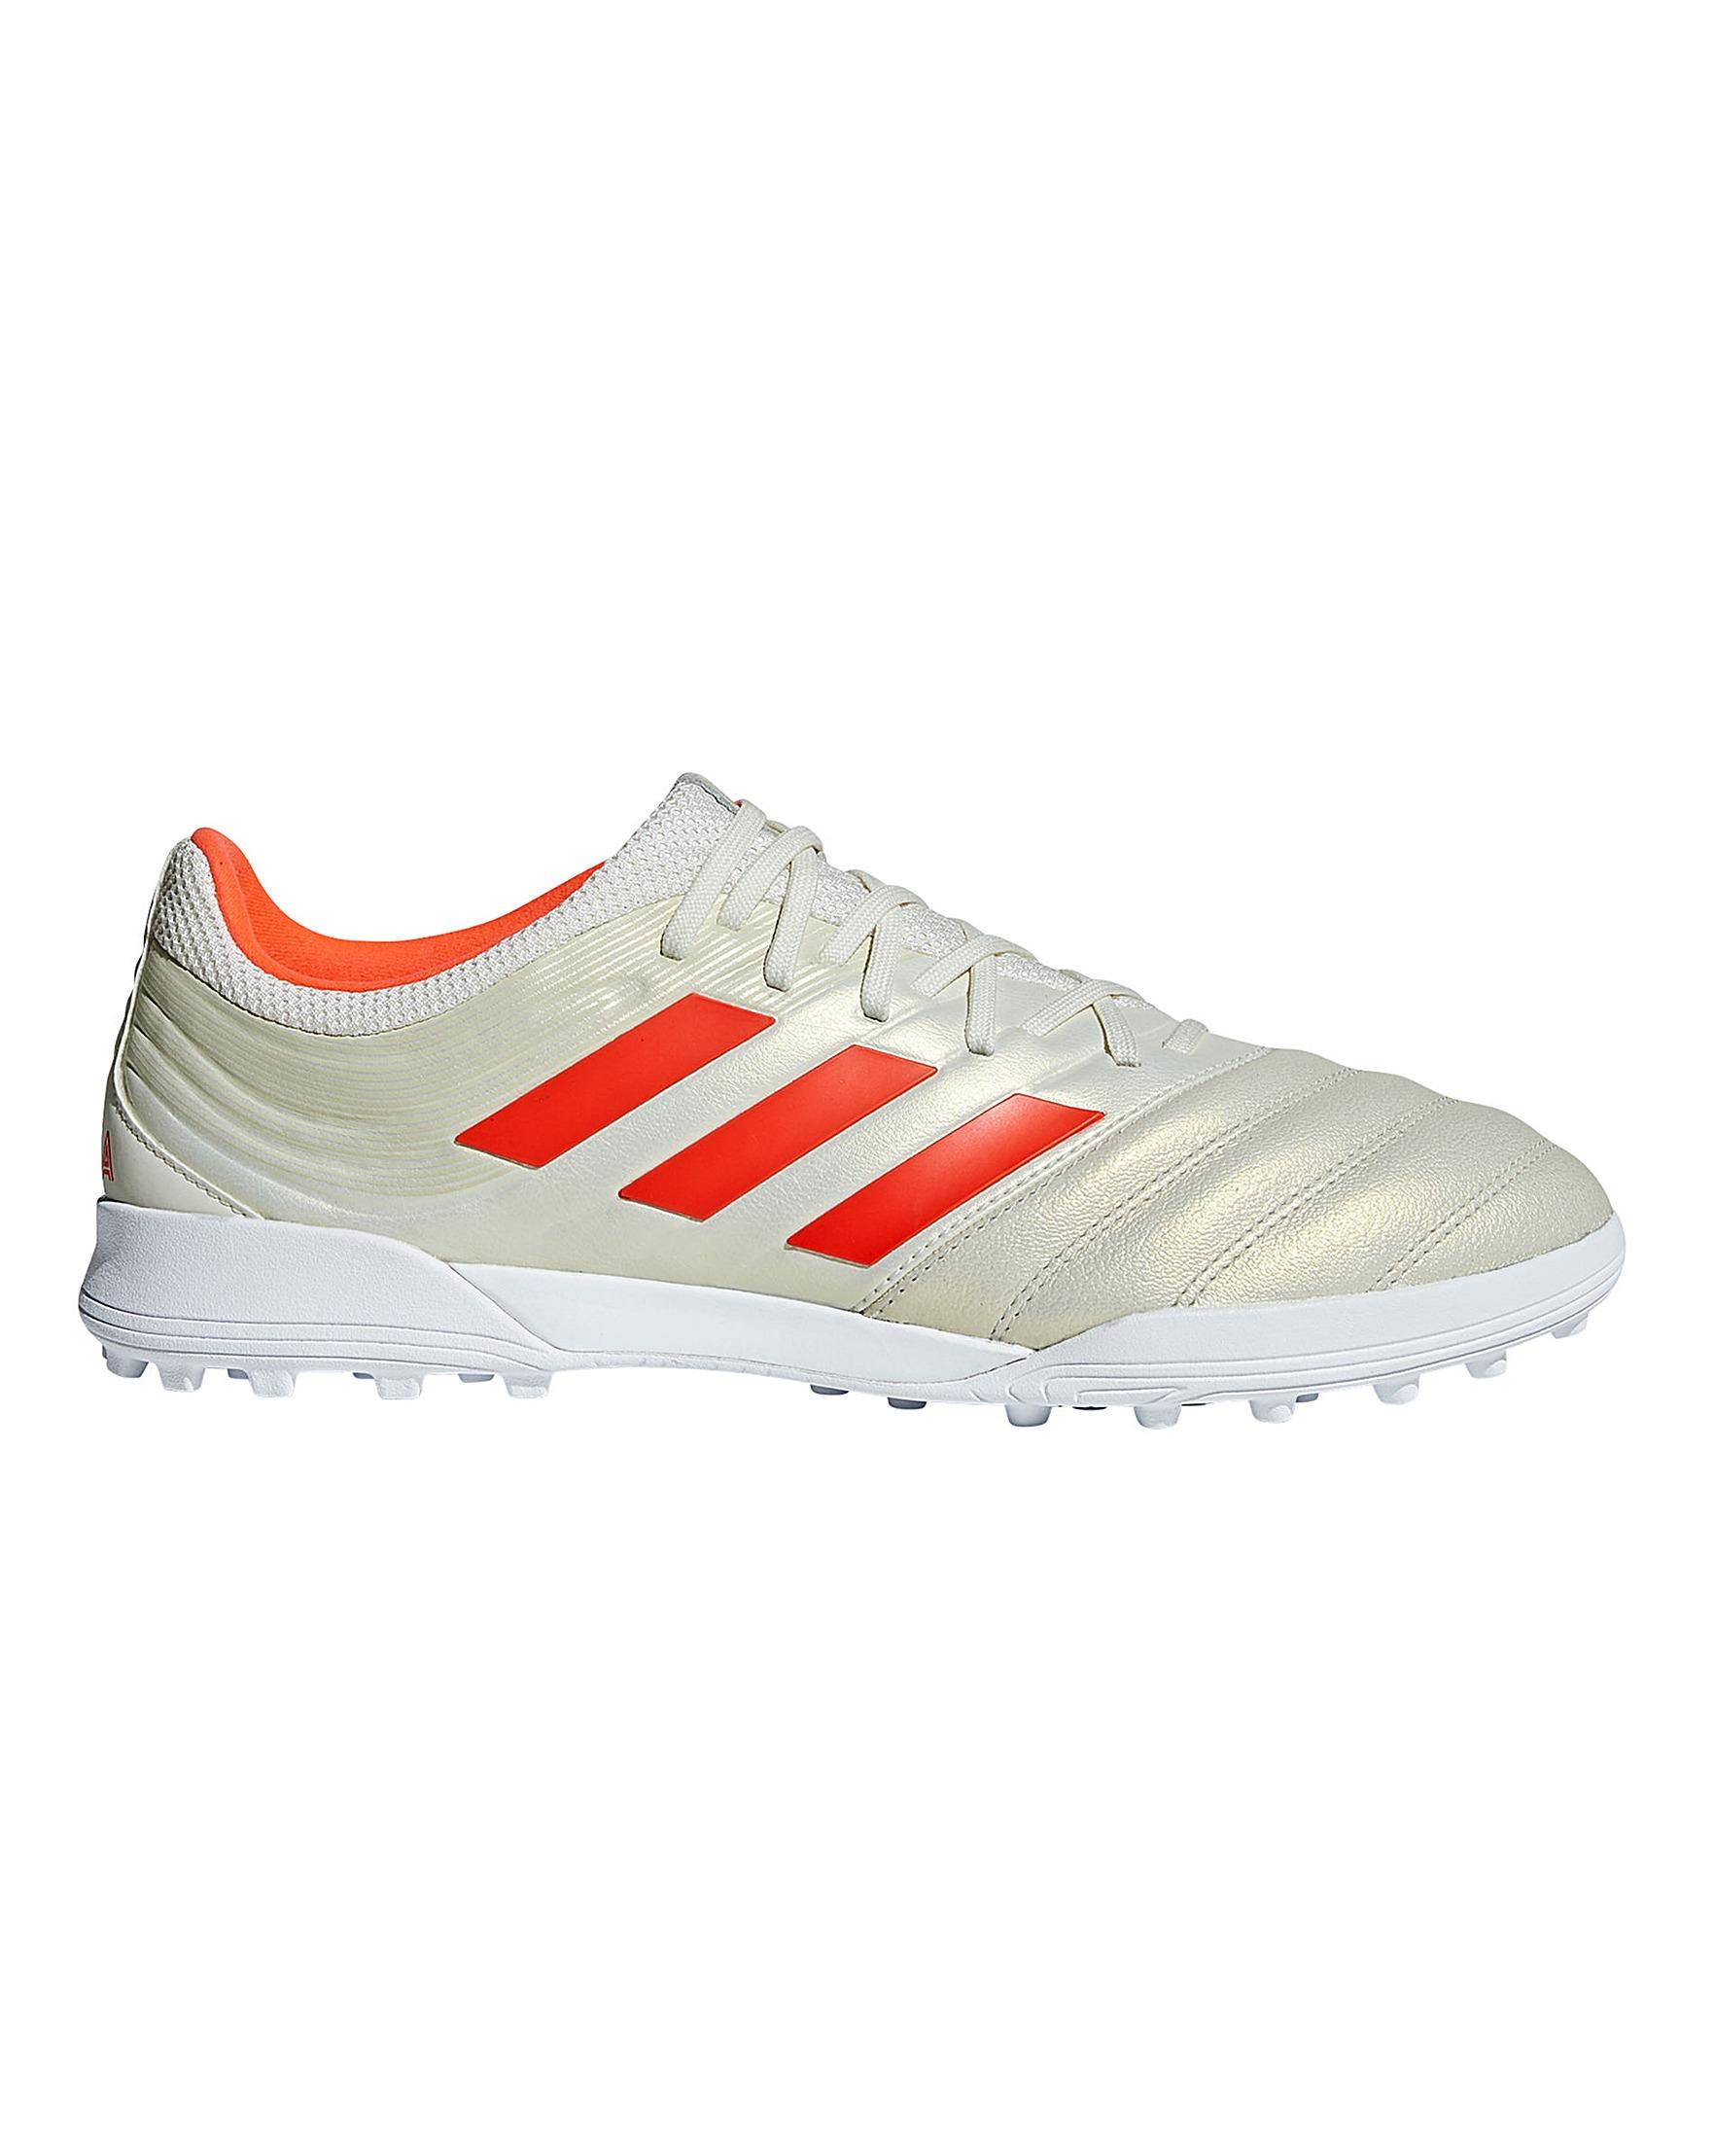 competitive price 8ac30 87029 adidas Copa 19.3 Turf Boots   Jacamo